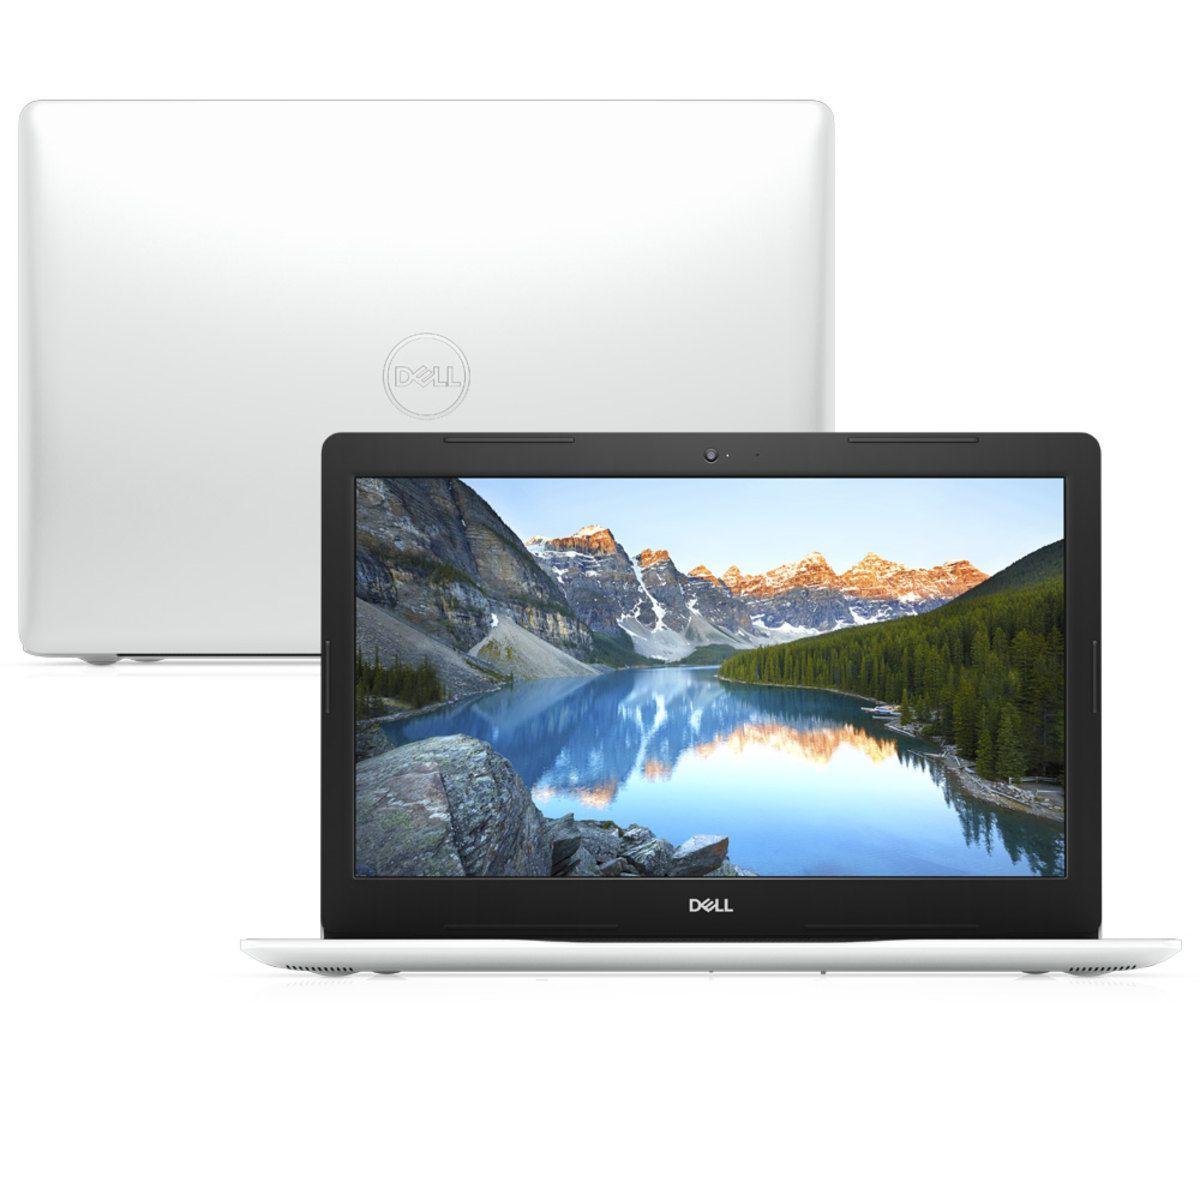 Notebook Dell Inspiron 7580 i5-8265U| 8GB DDR4| HD 1TB| GeForce MX150 2GB GDDR5| 15.6 FHD| Win10 Home